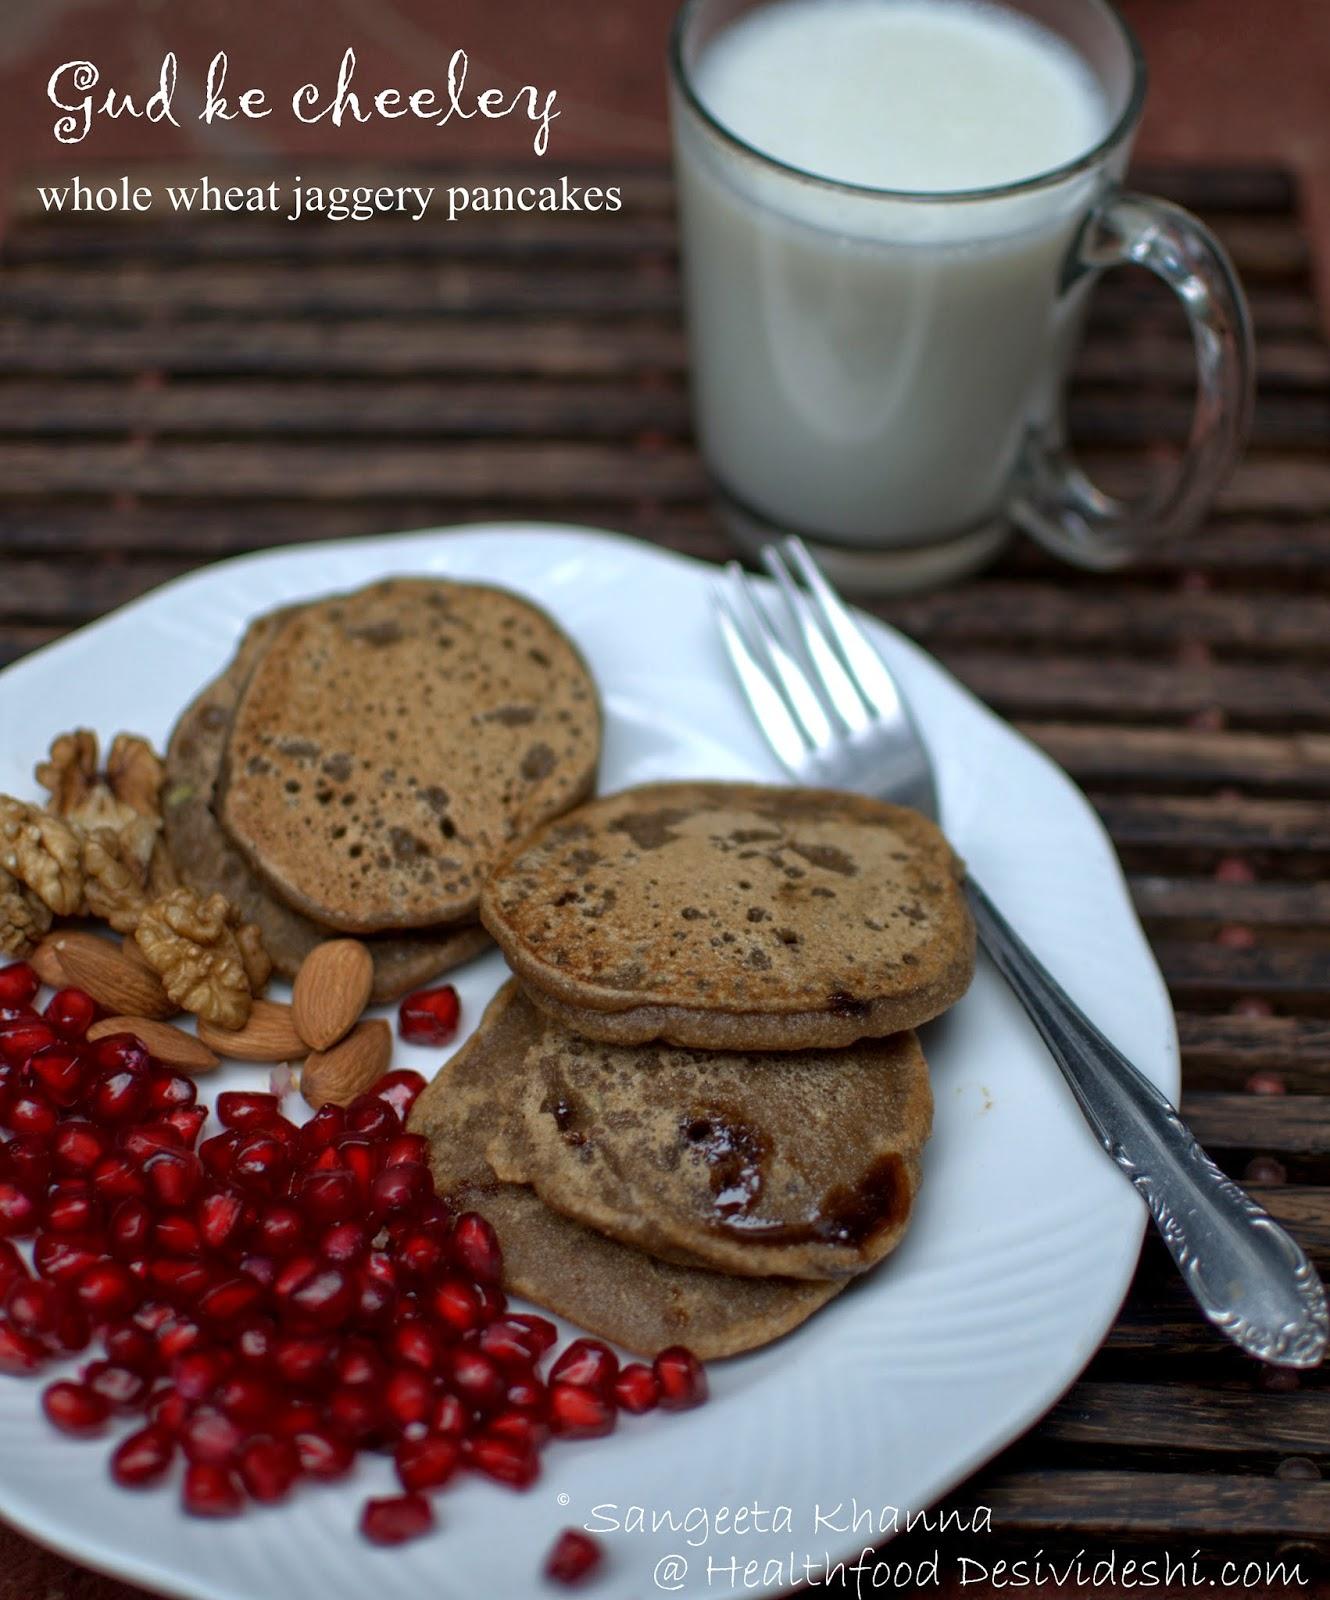 gud wale cheeley / jaggery pancakes